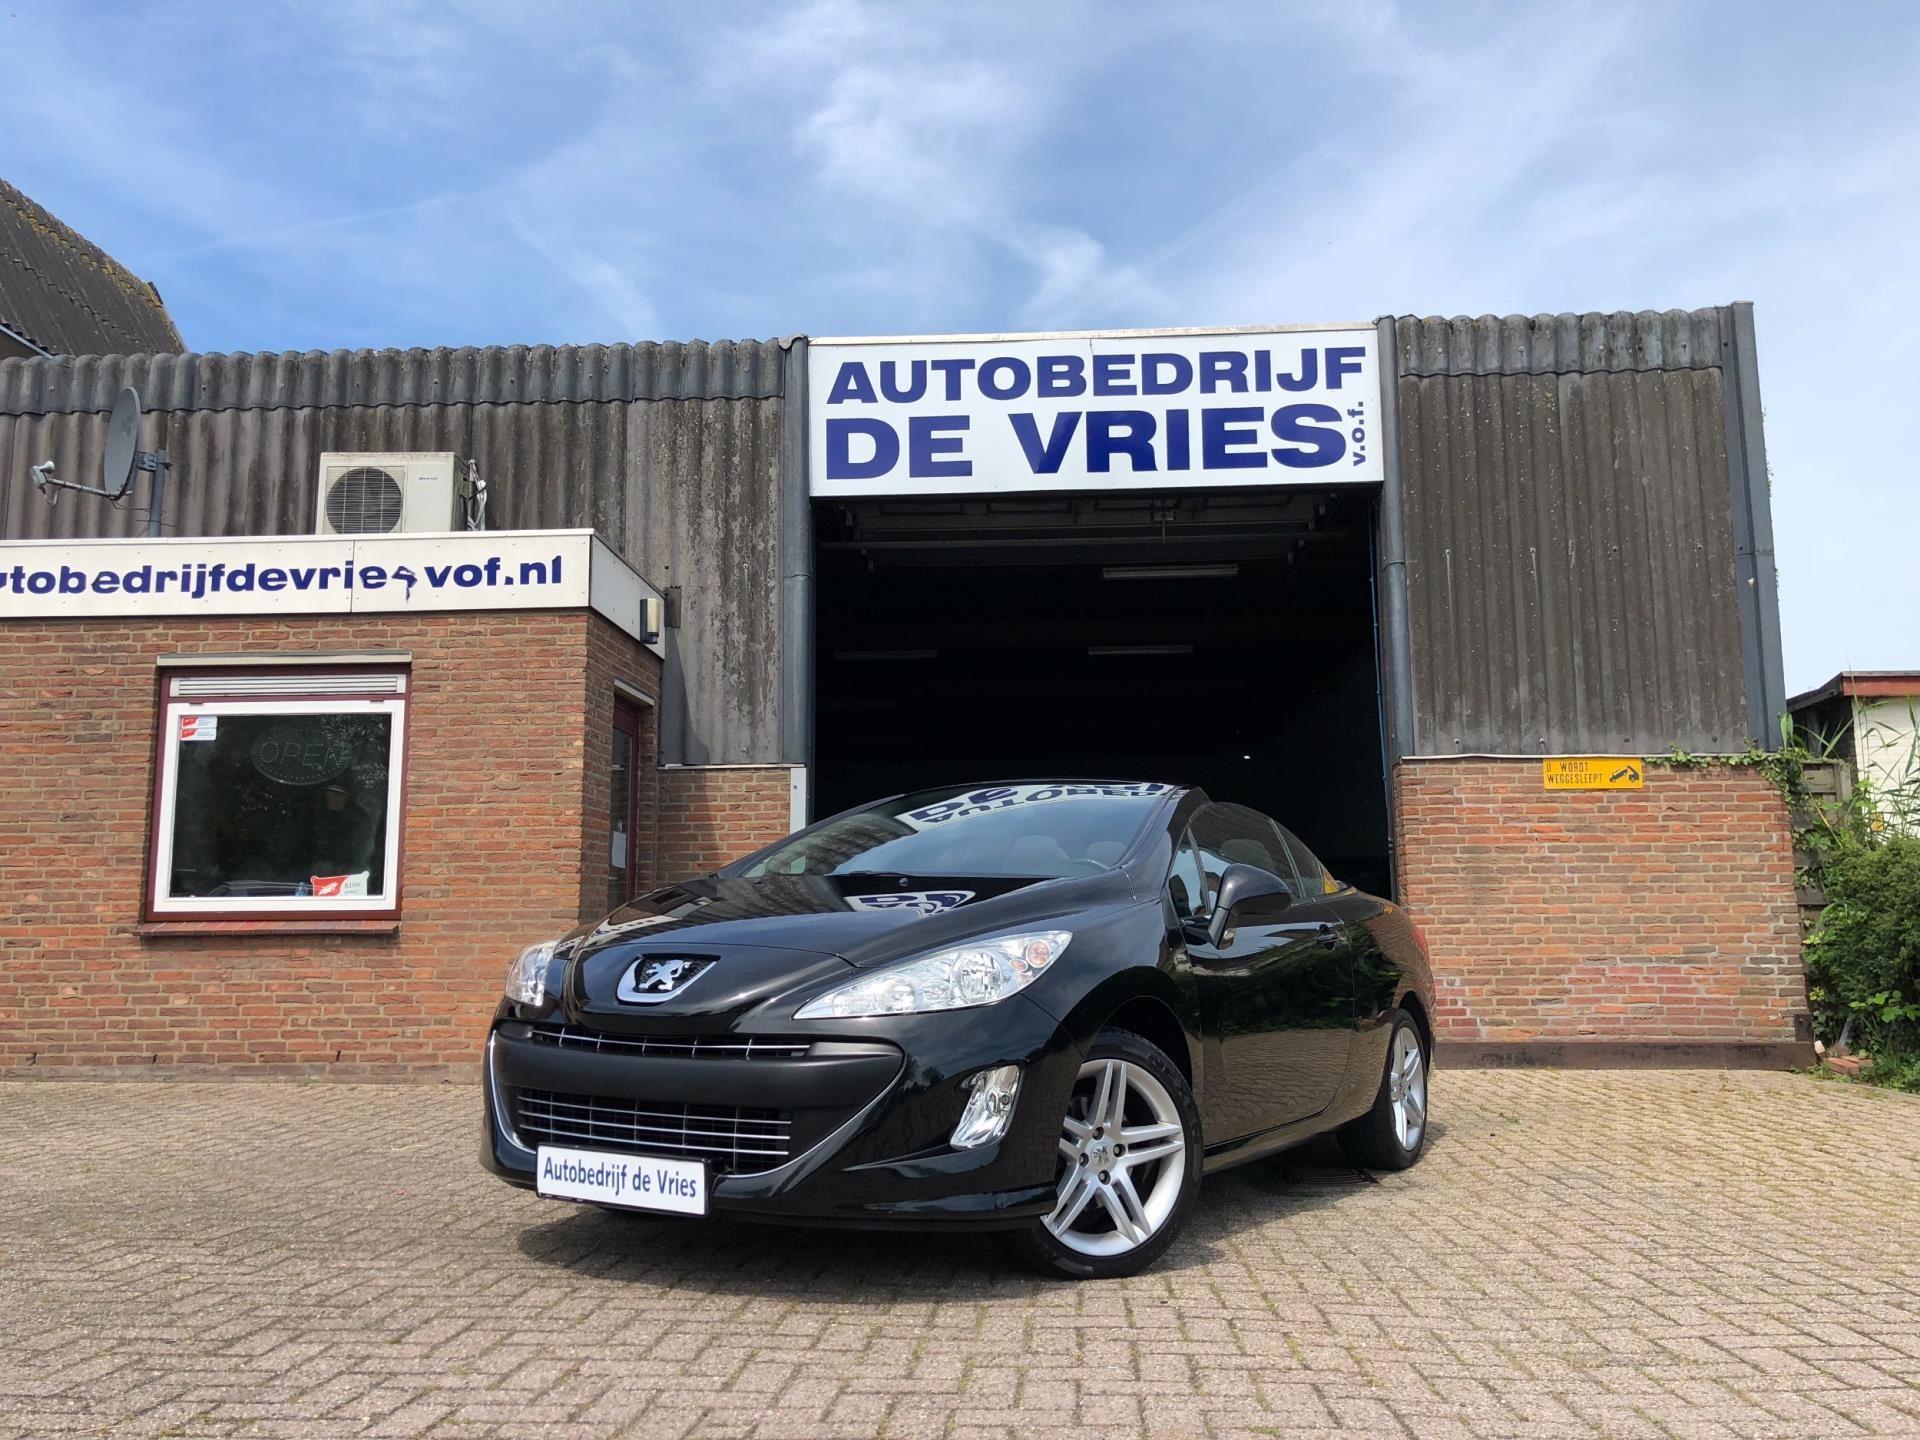 Peugeot 308 CC occasion - Autobedrijf de Vries